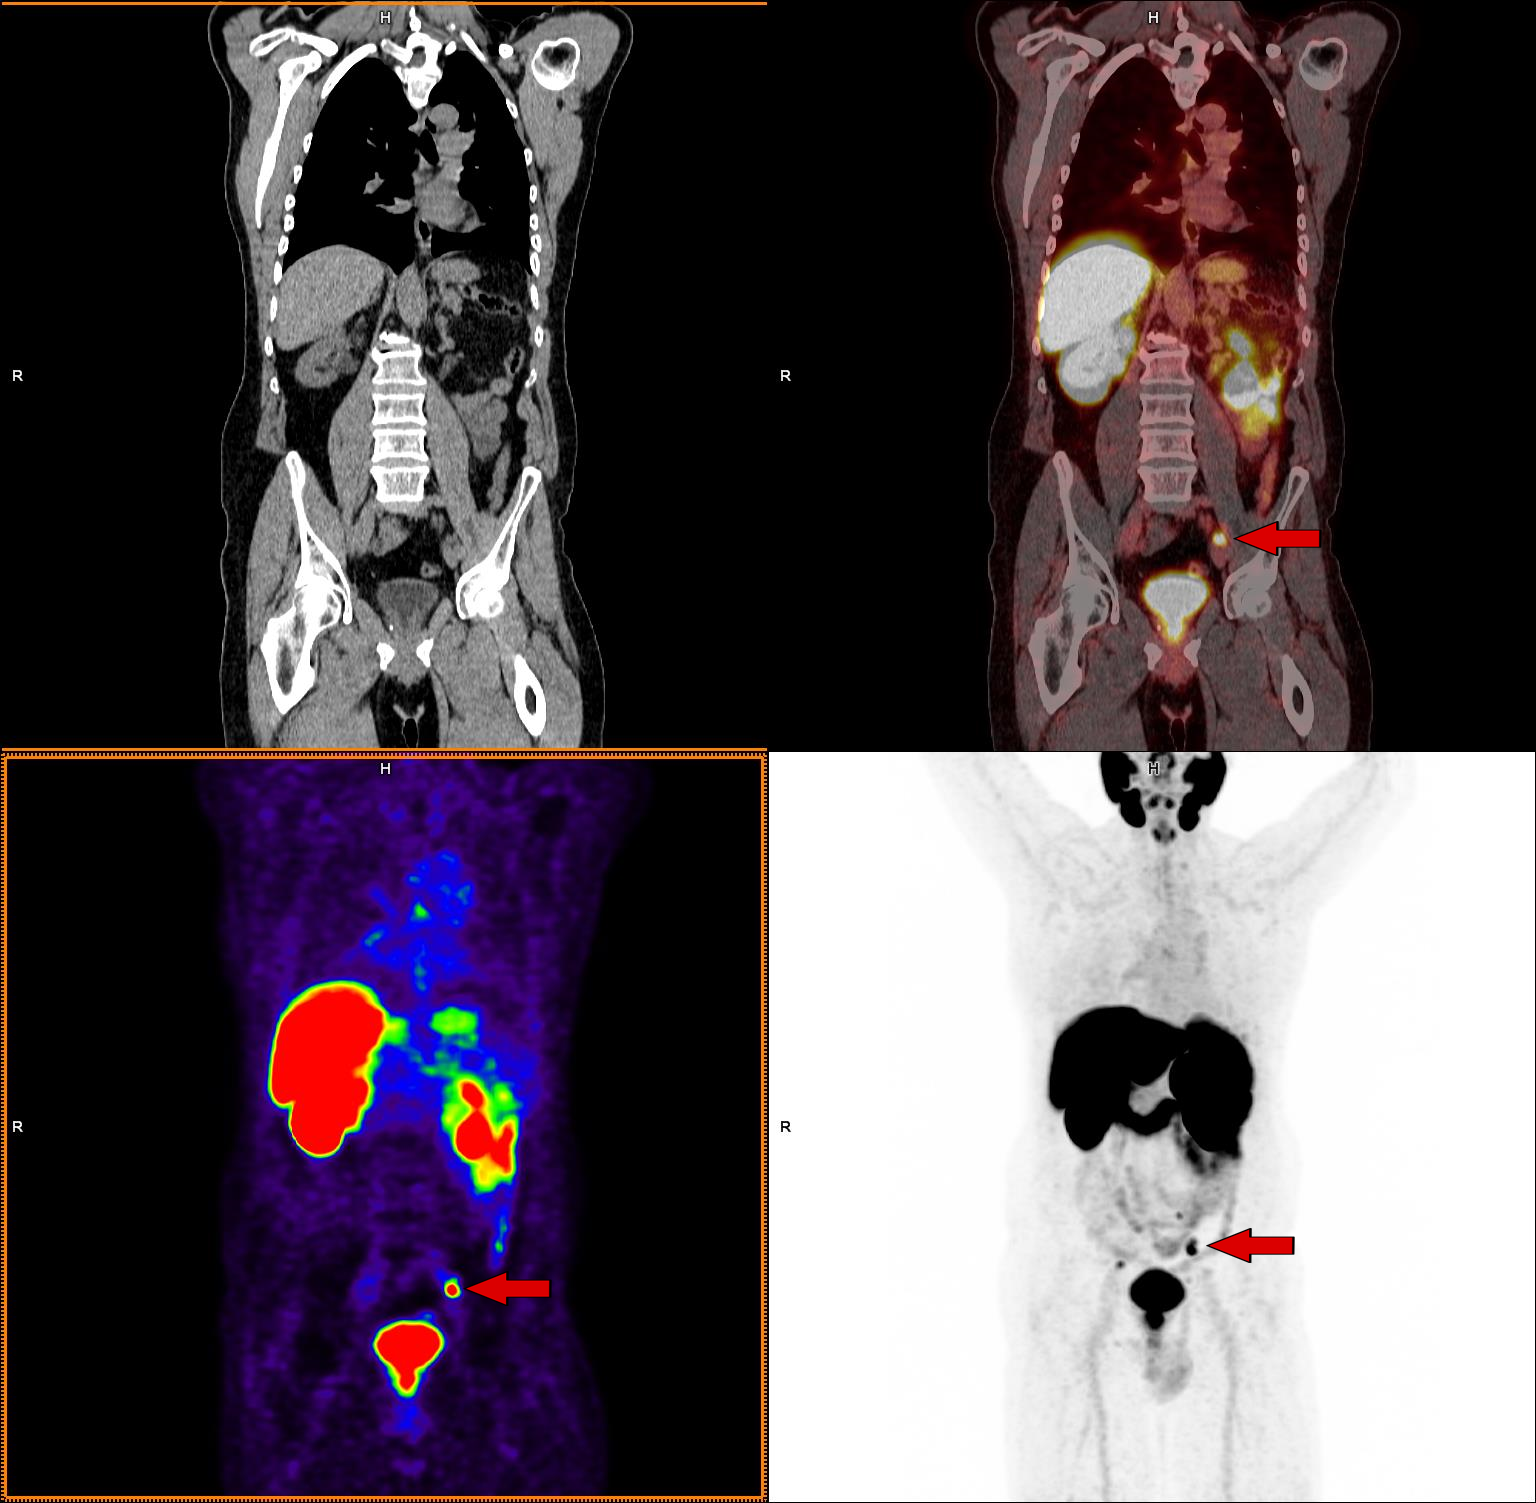 cáncer de próstata con escáner axumin